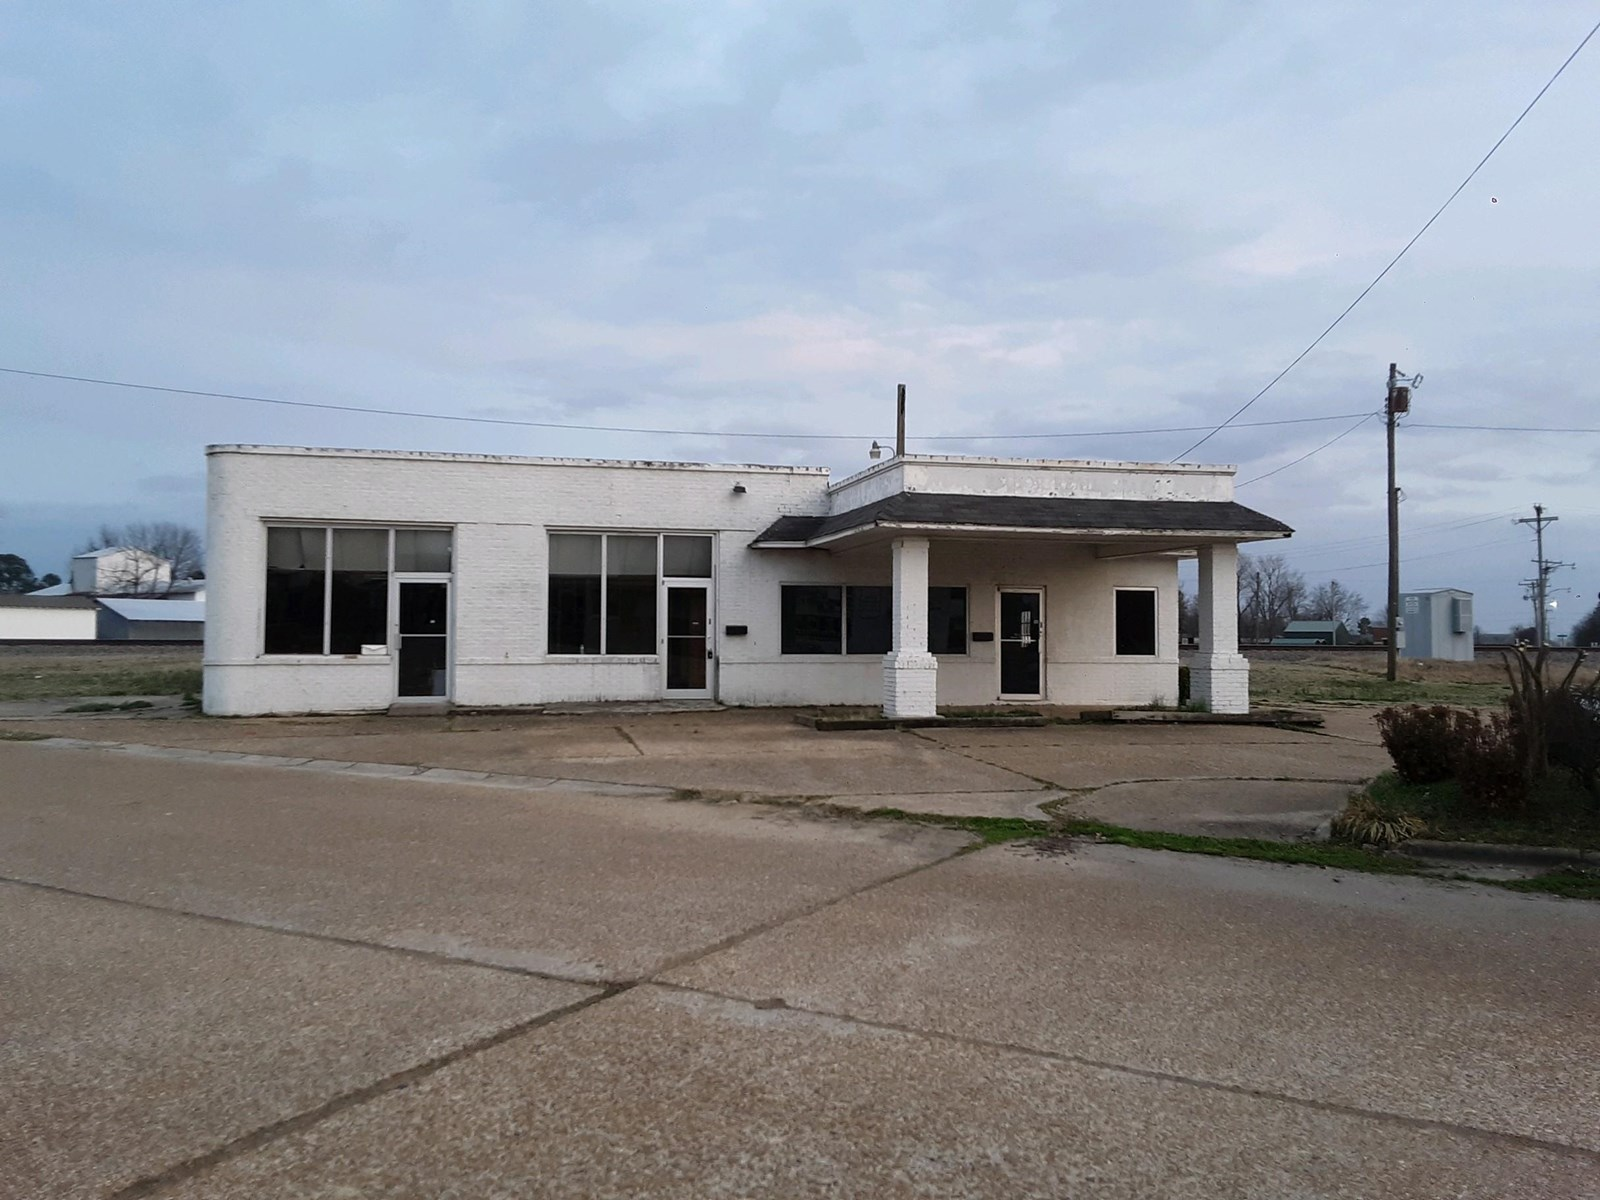 commercial Building in Rector AR.